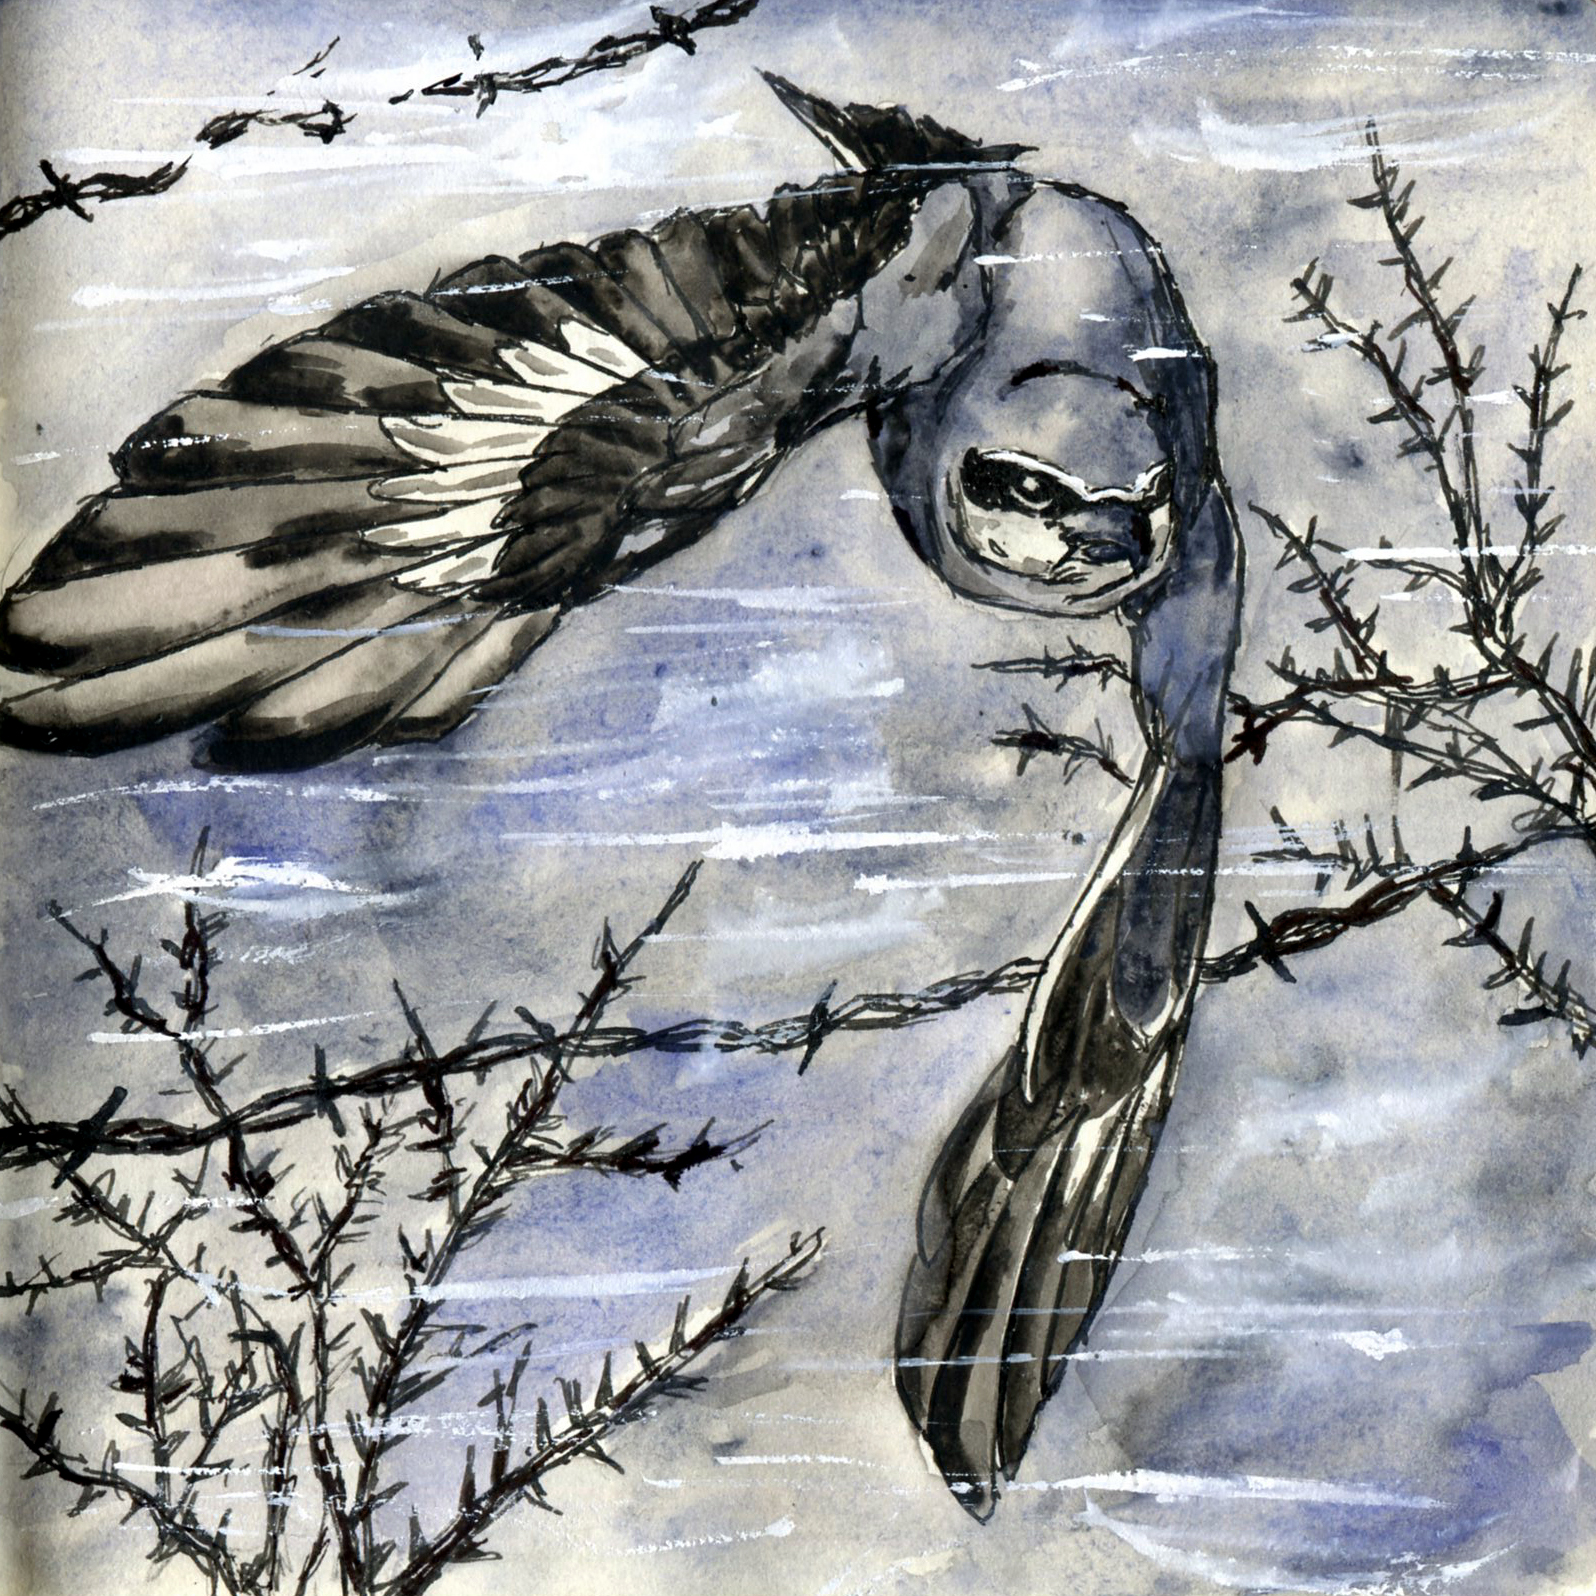 Shrikes